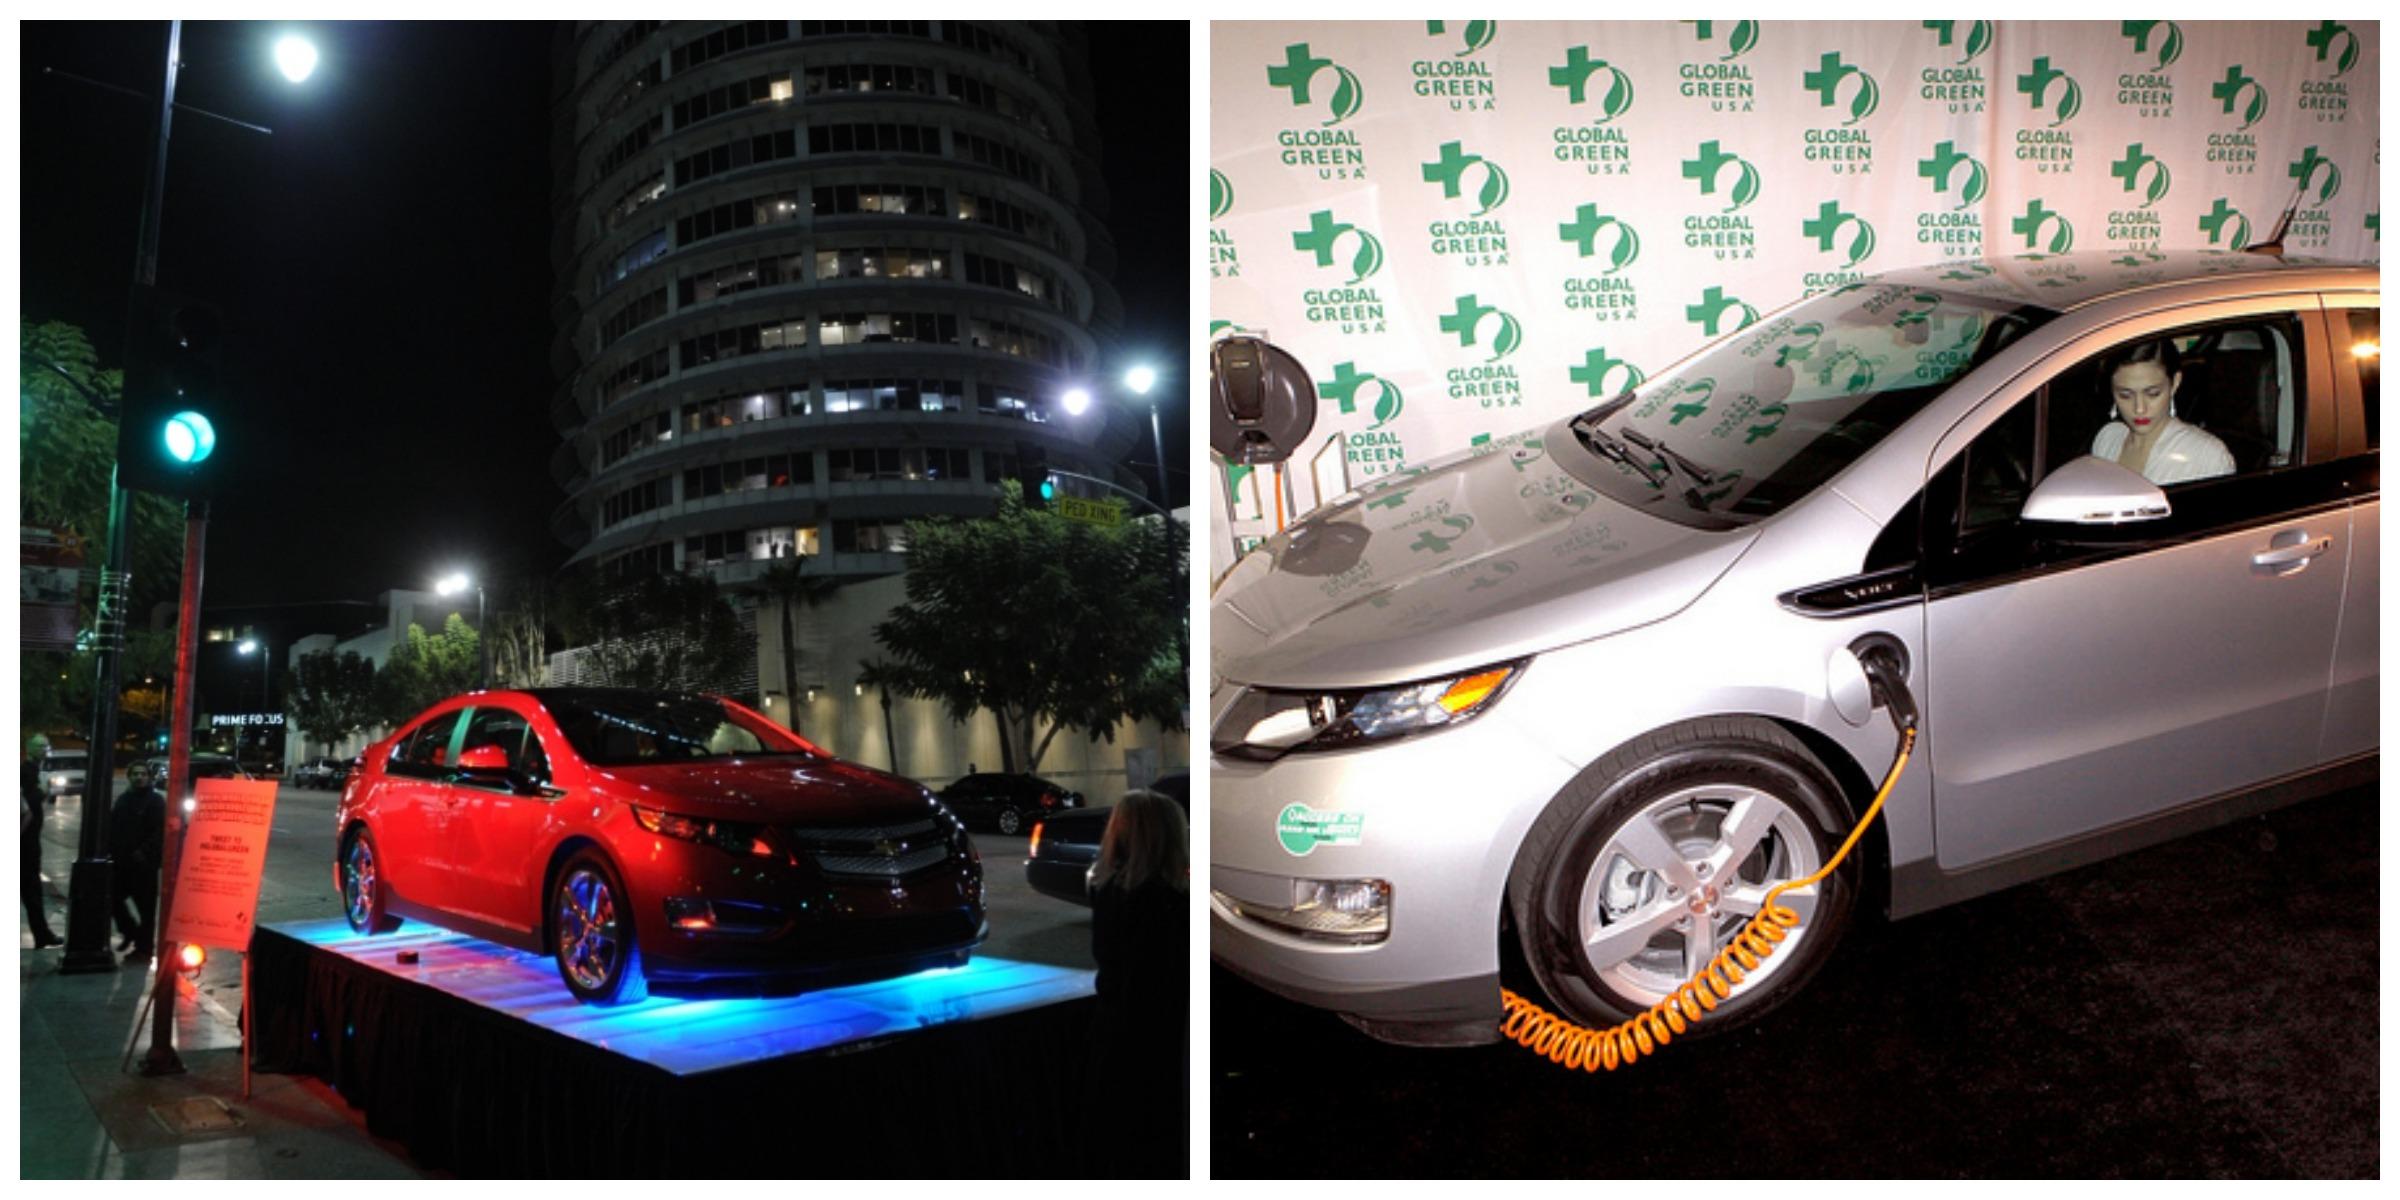 Green Cars Global Green USA Pre-Oscar Party